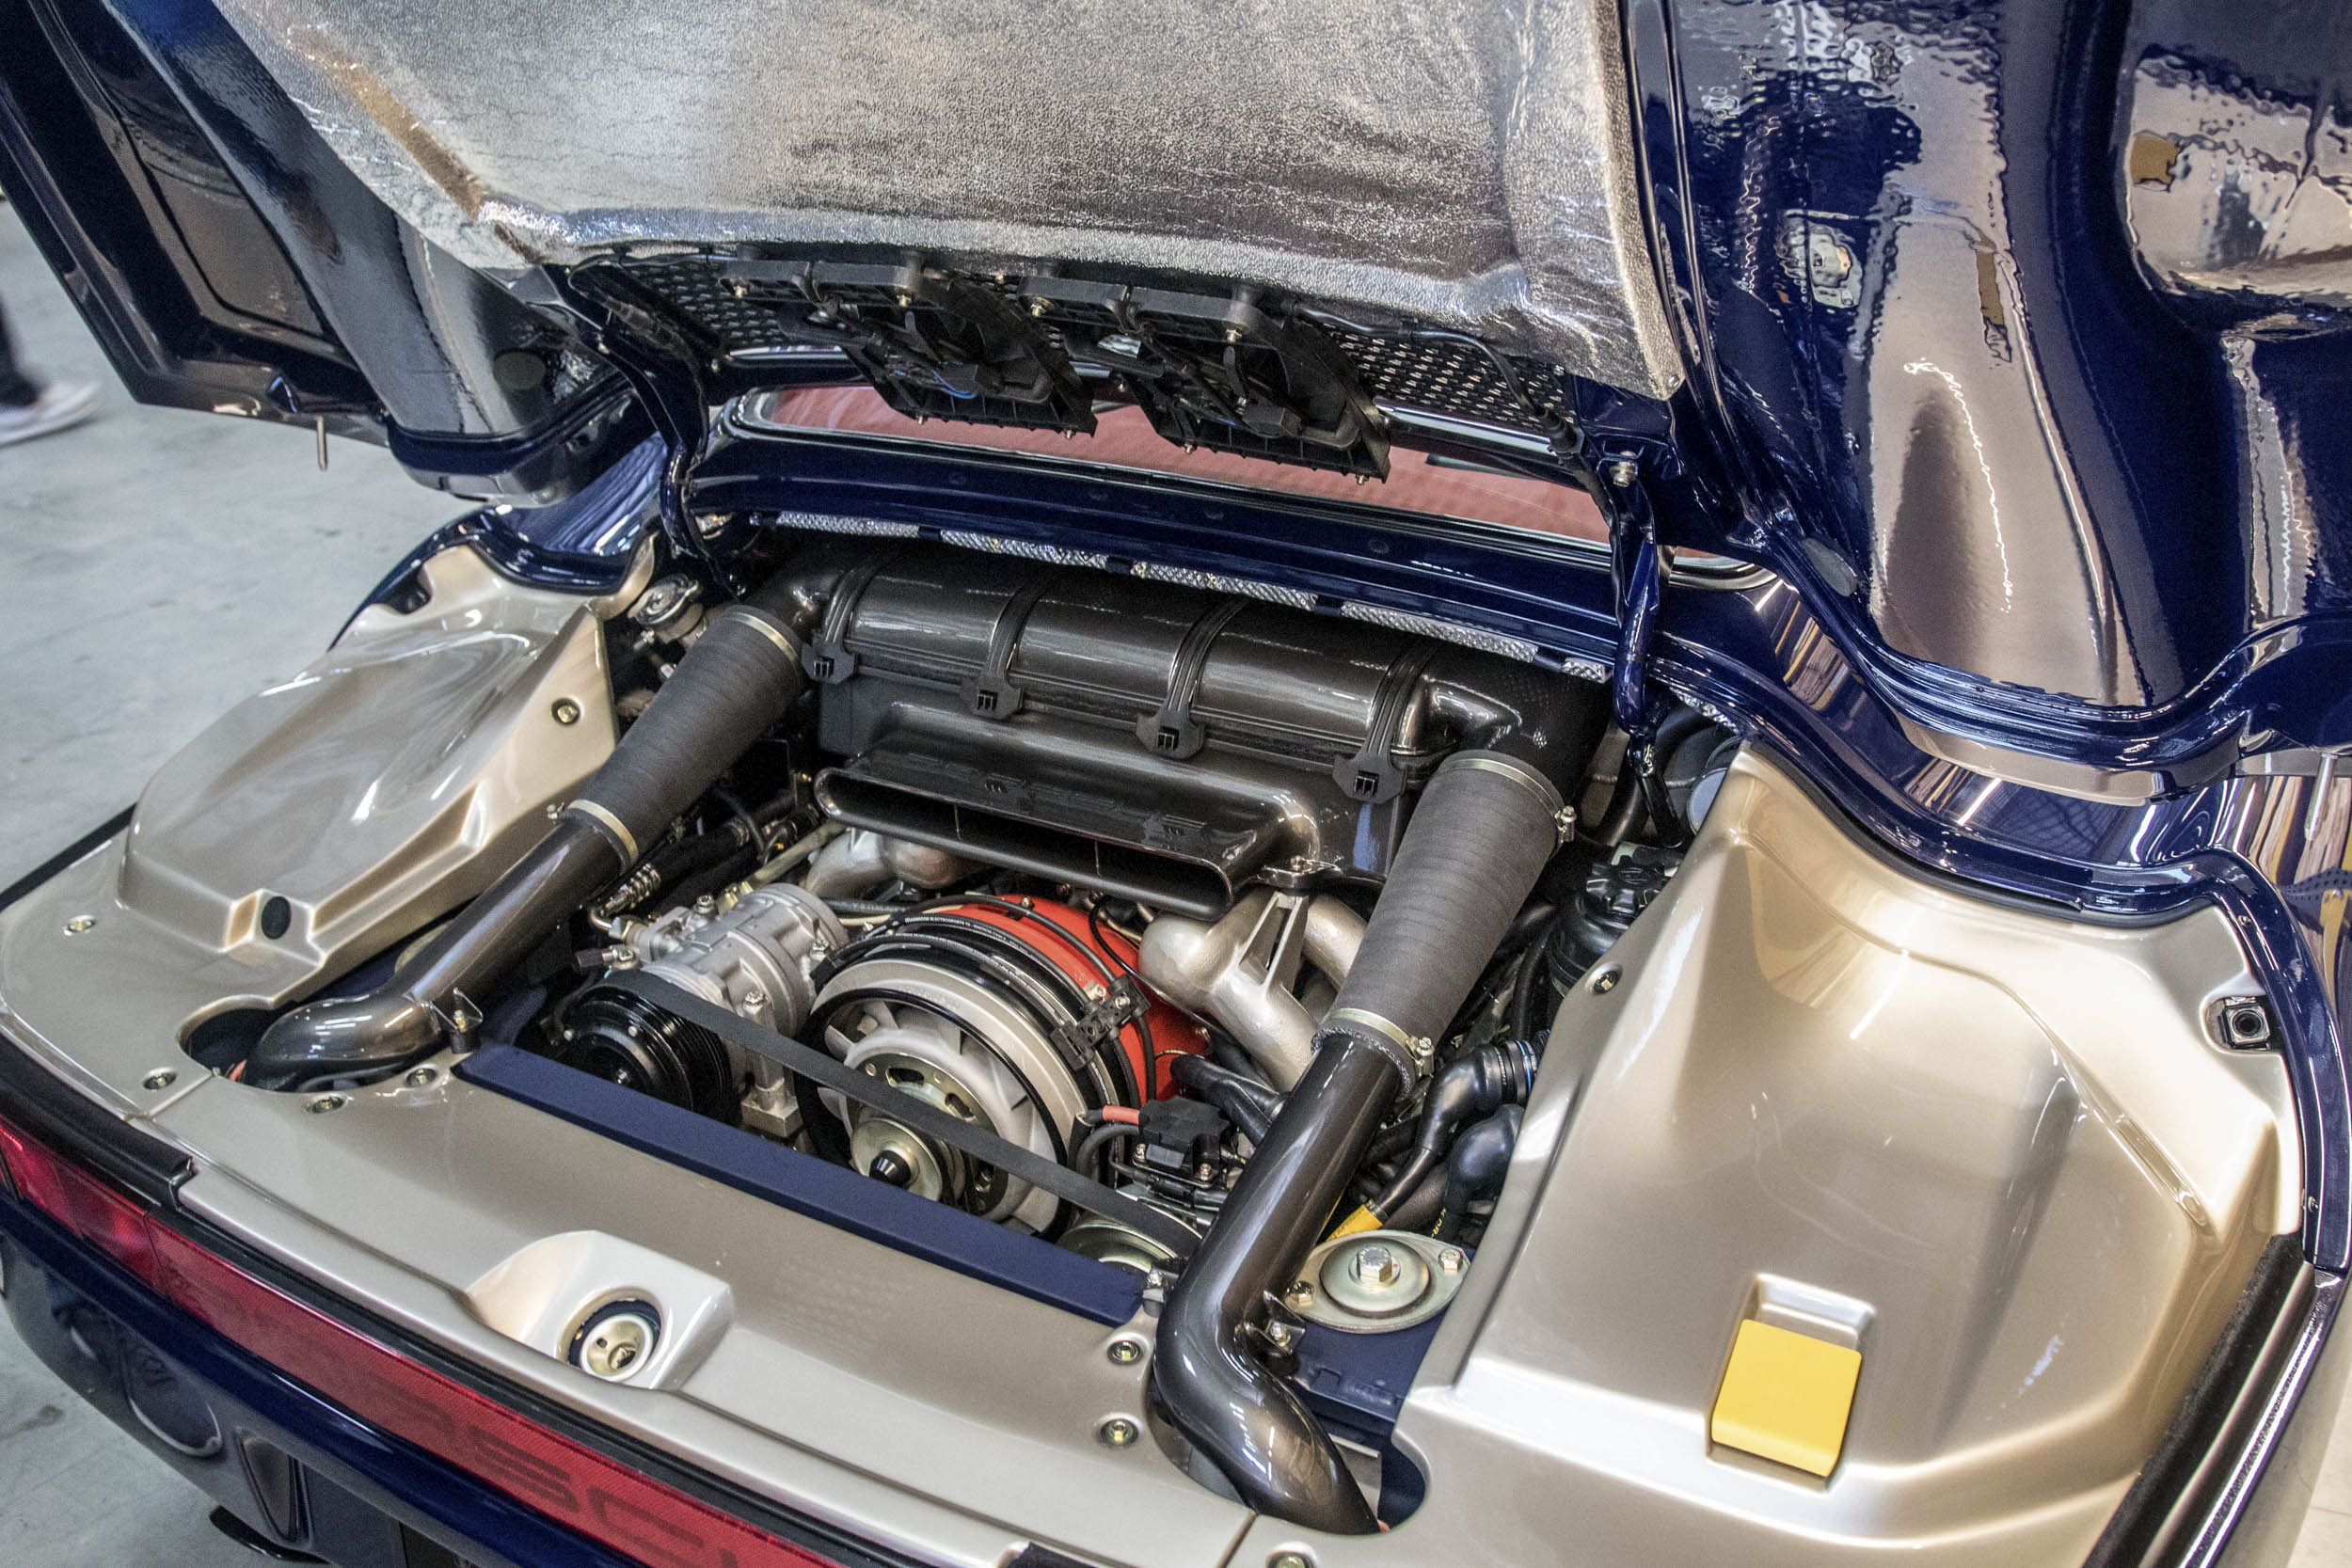 Porsche engine at Luftgekühlt